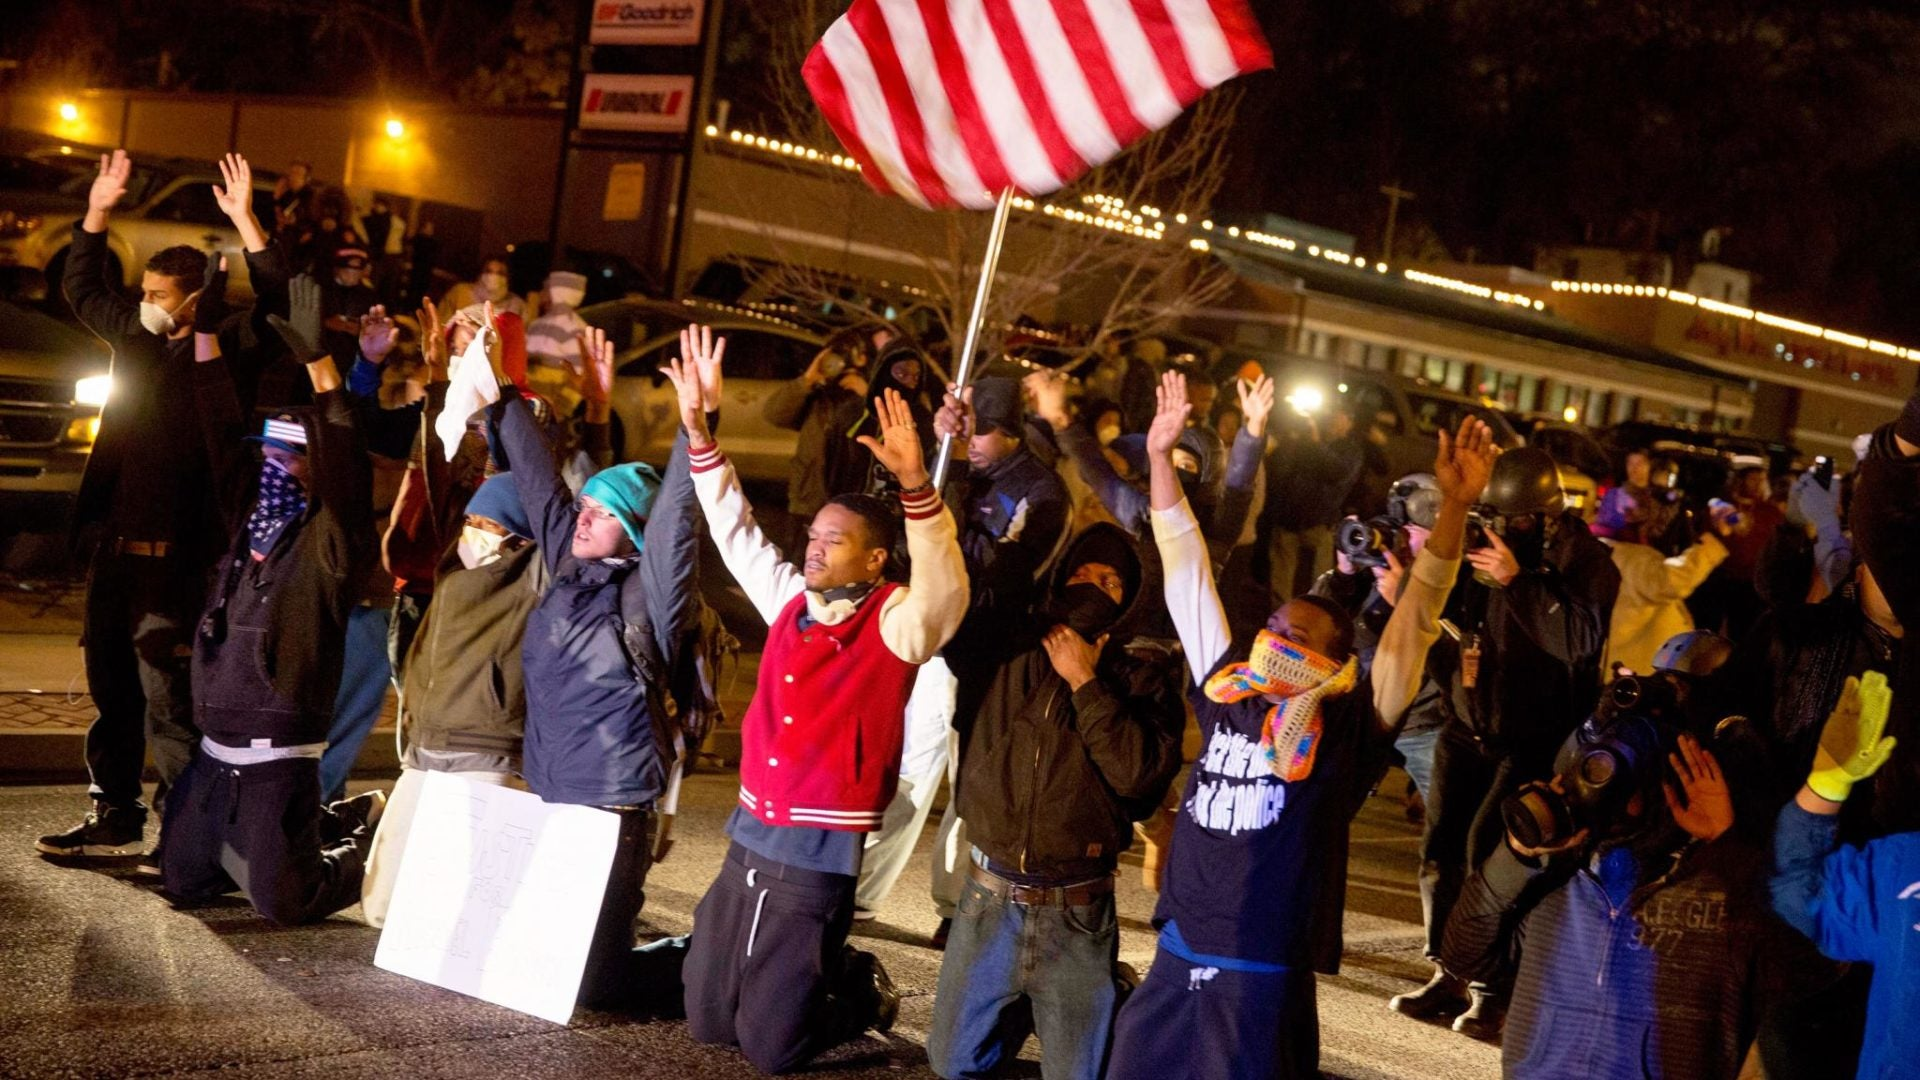 Community Organizer DeRay McKesson Details What's Next for Ferguson